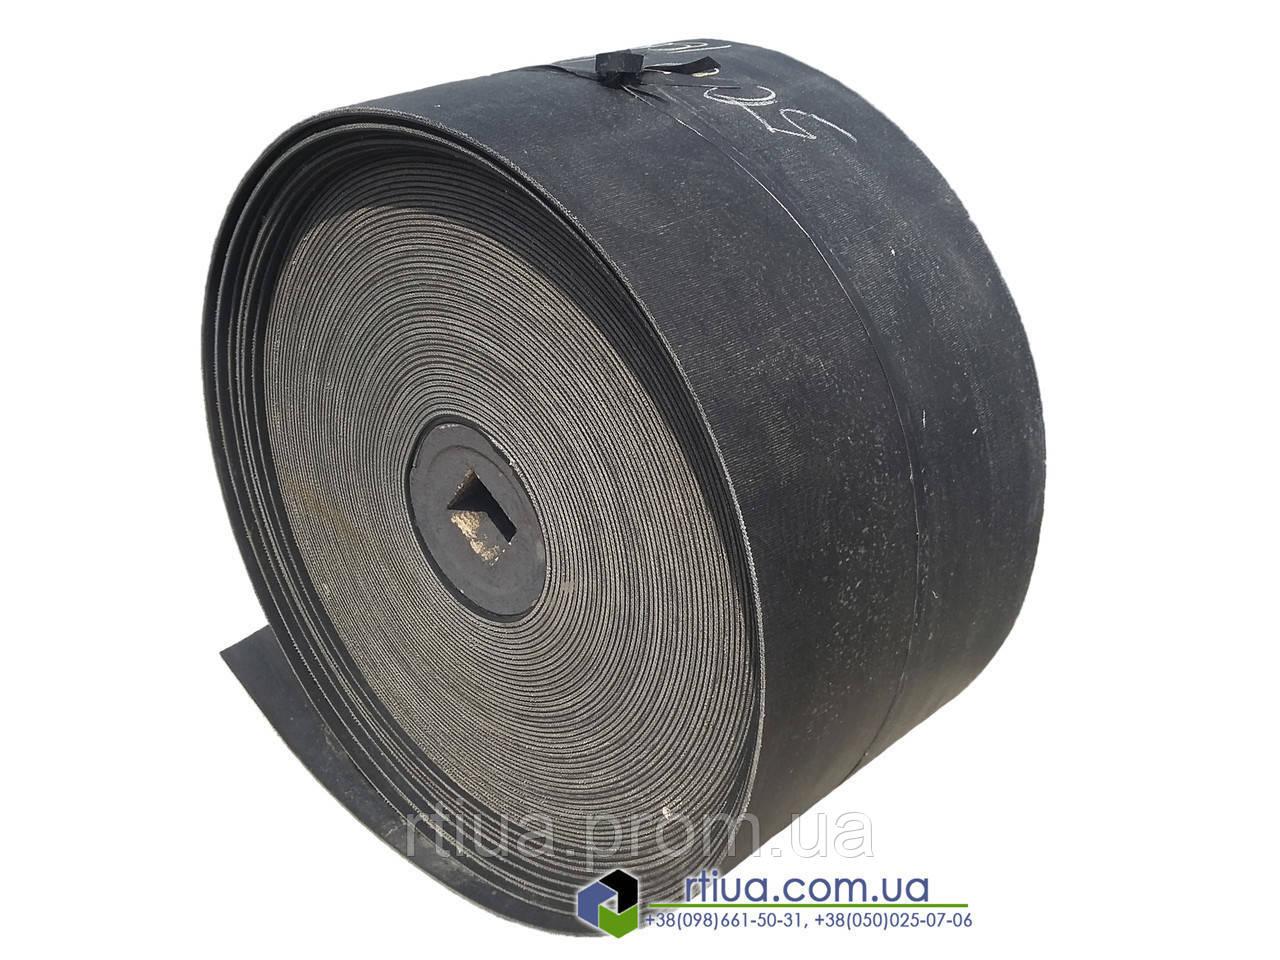 Конвейерная лента 150х3 мм